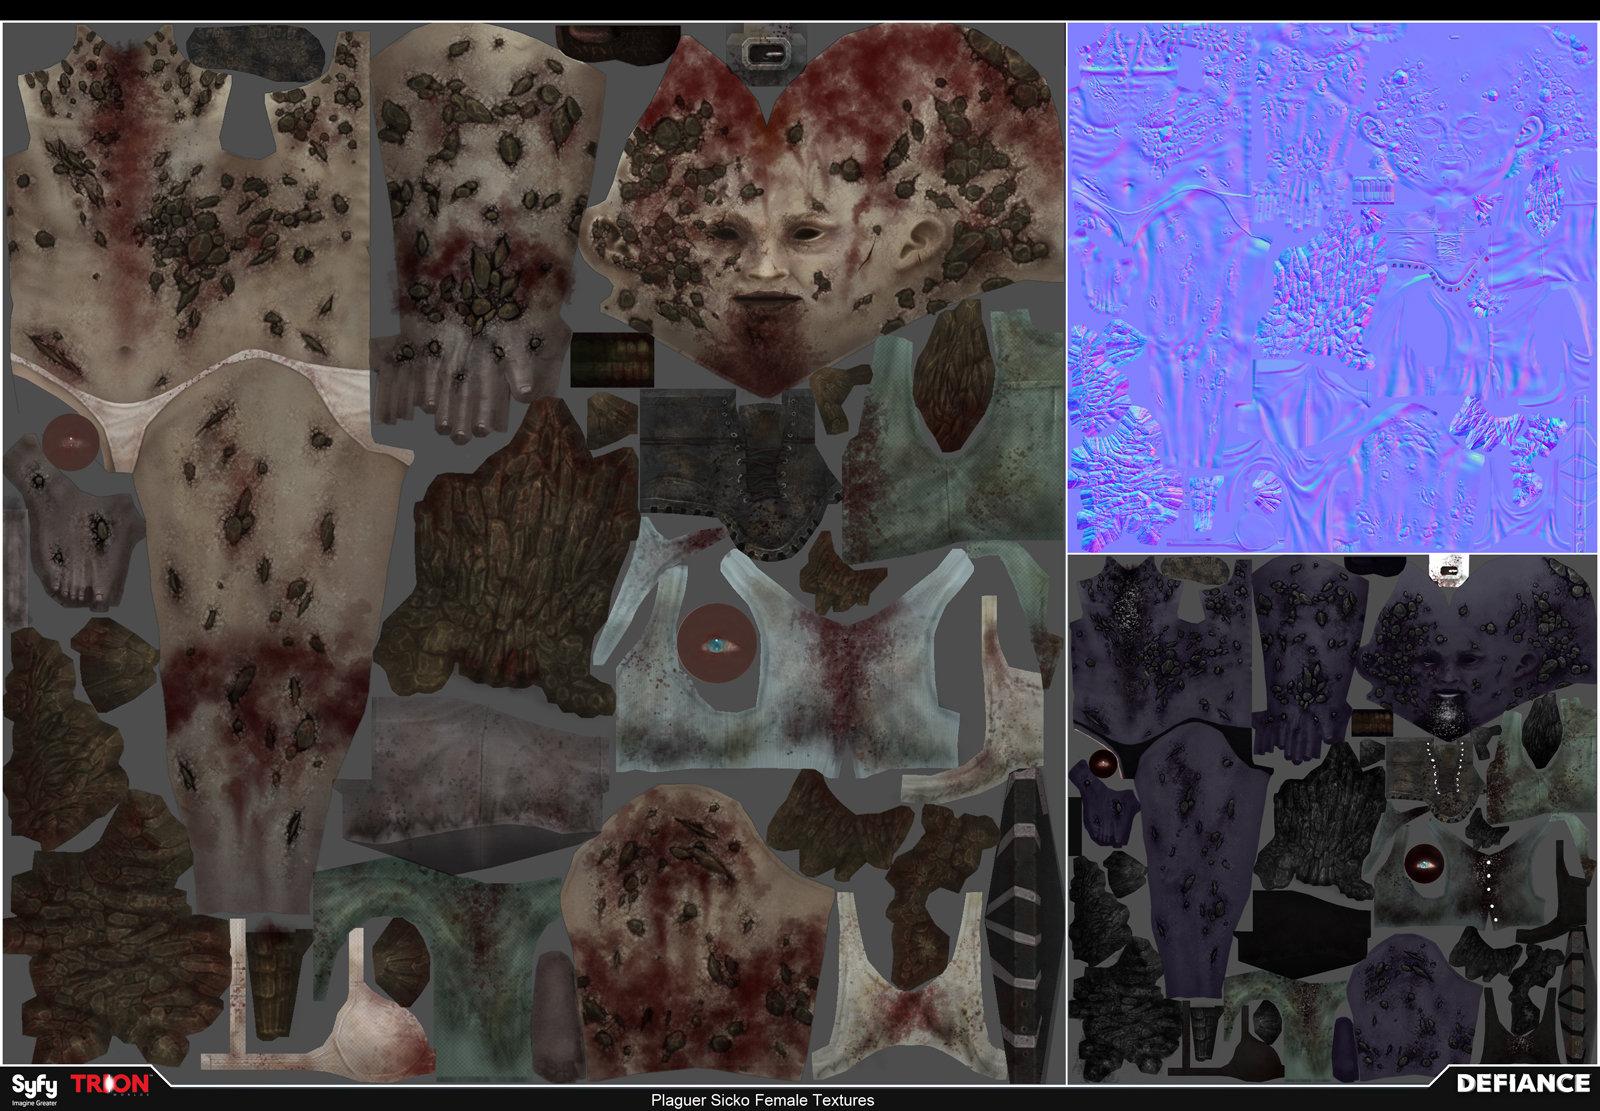 Satoshi arakawa npc female plaguer textures